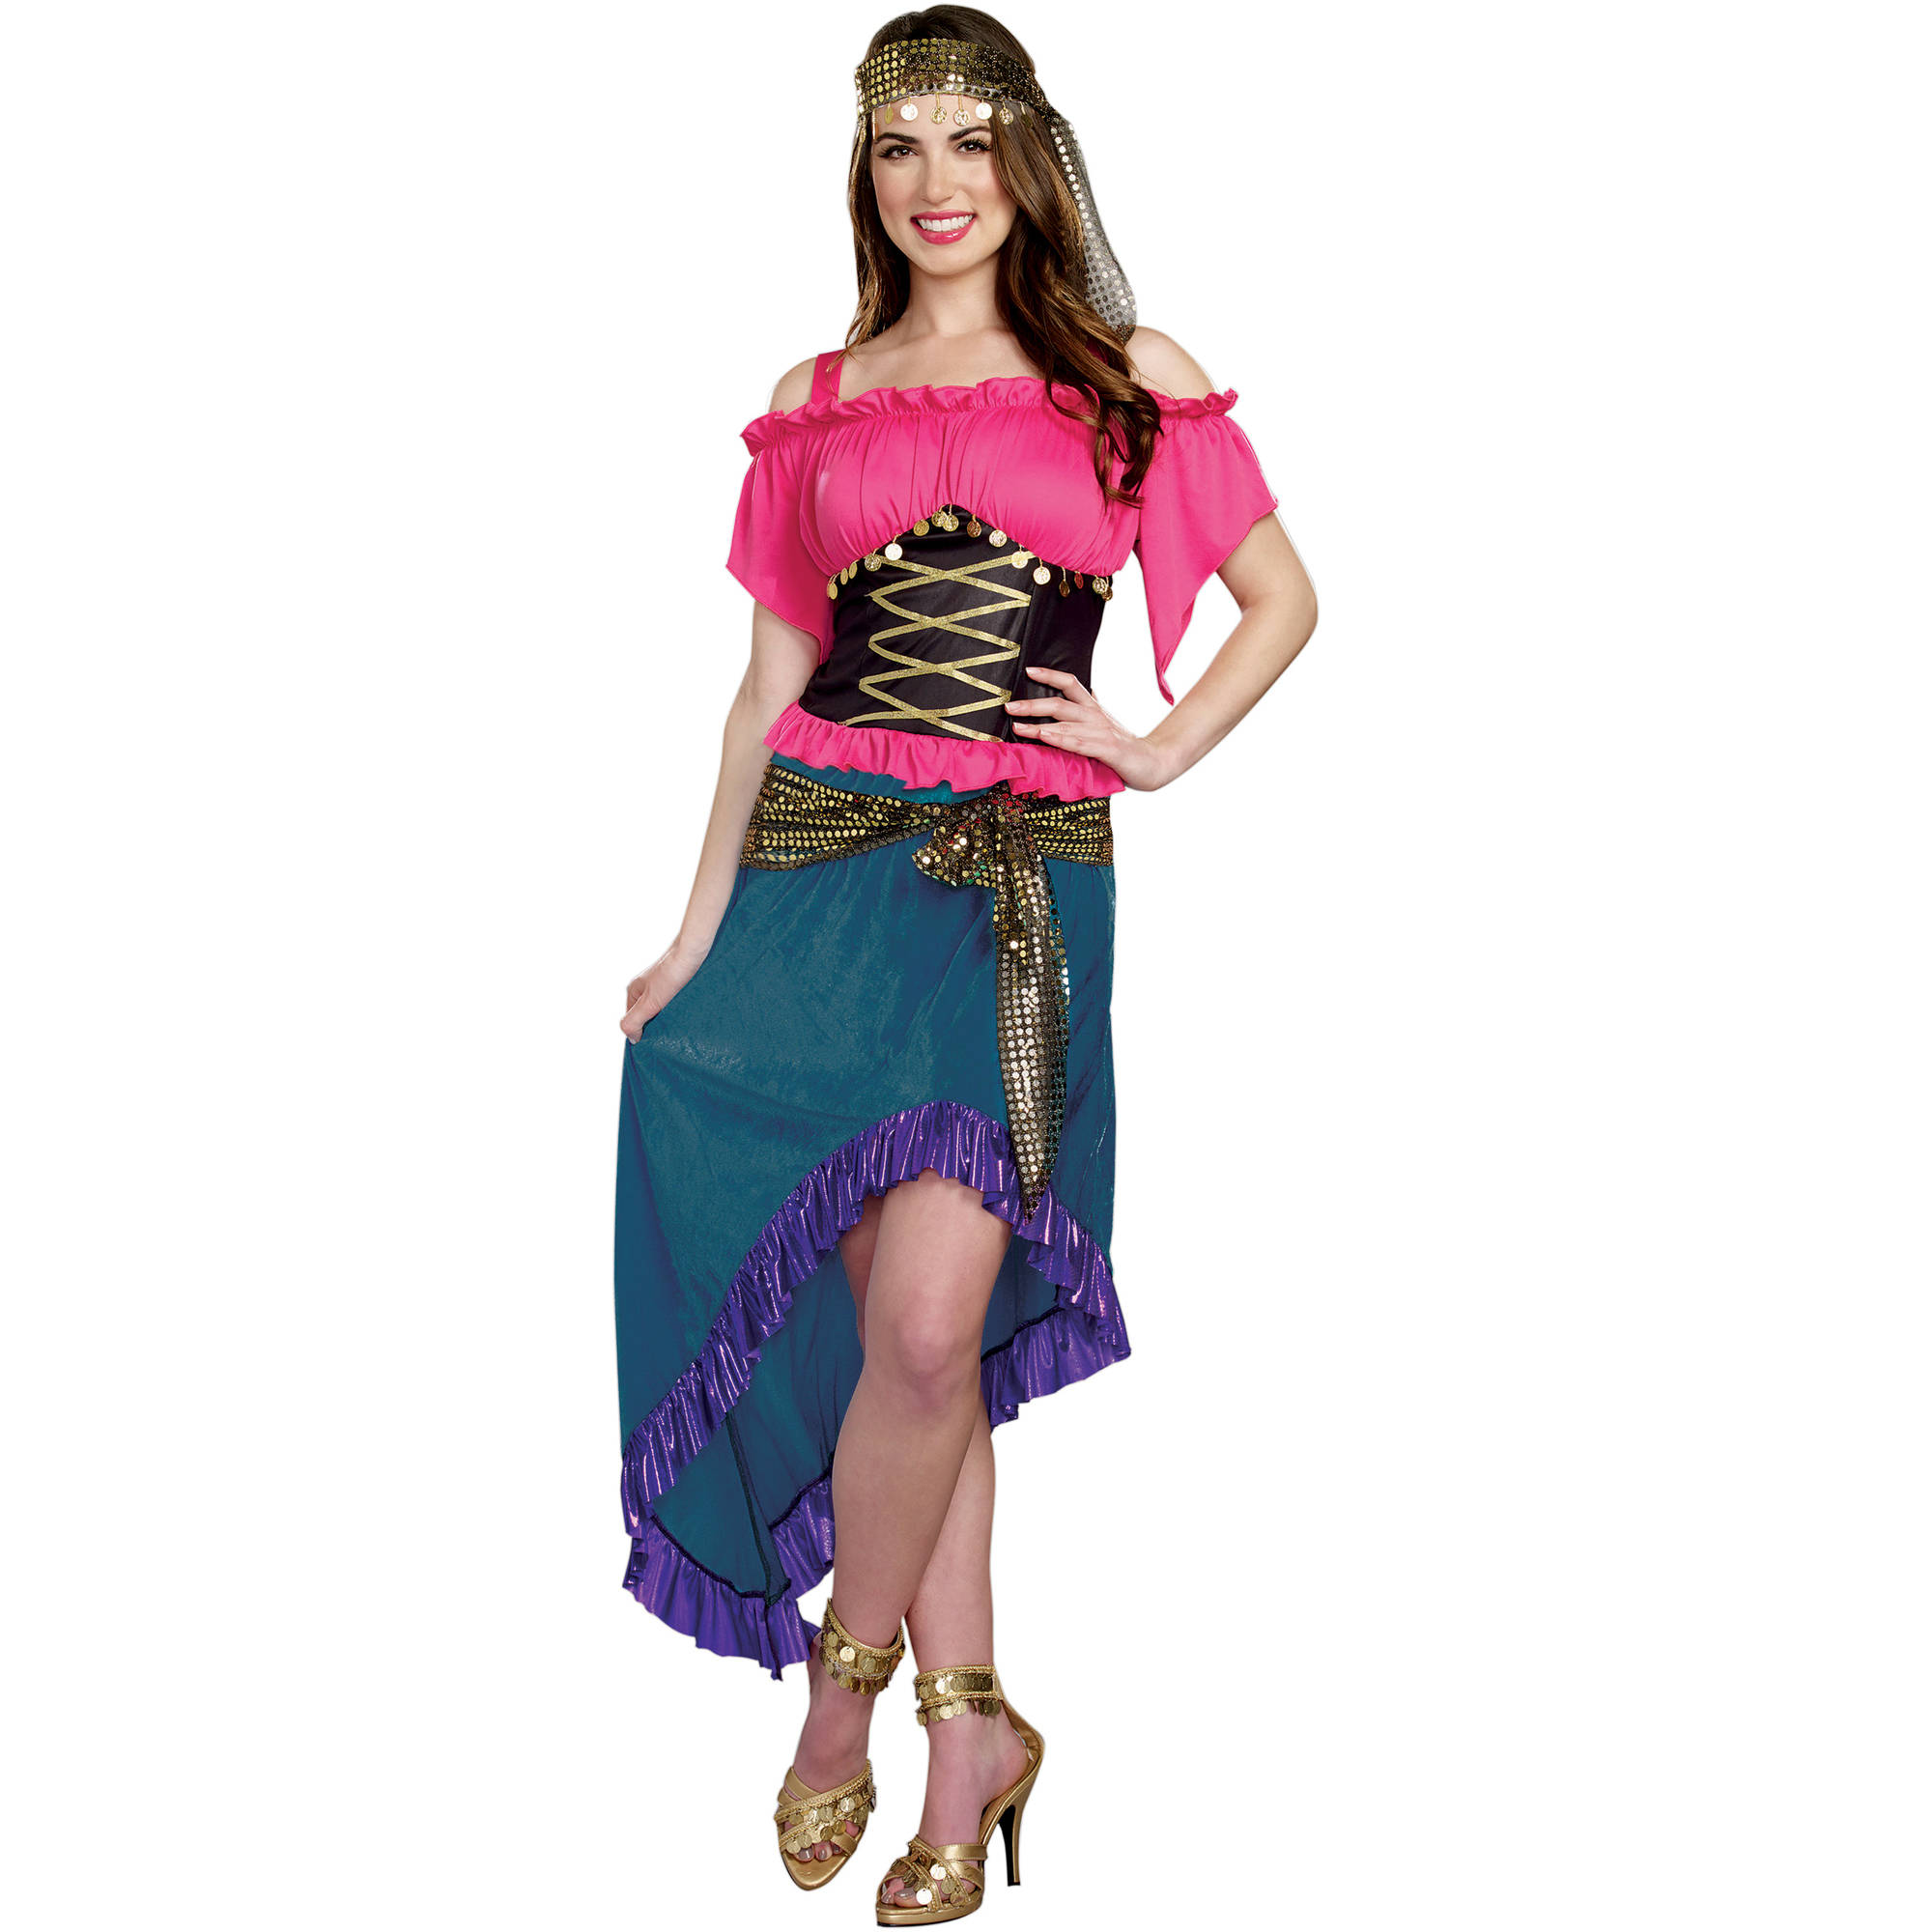 Bohemian Dream Adult Women's Halloween Costume